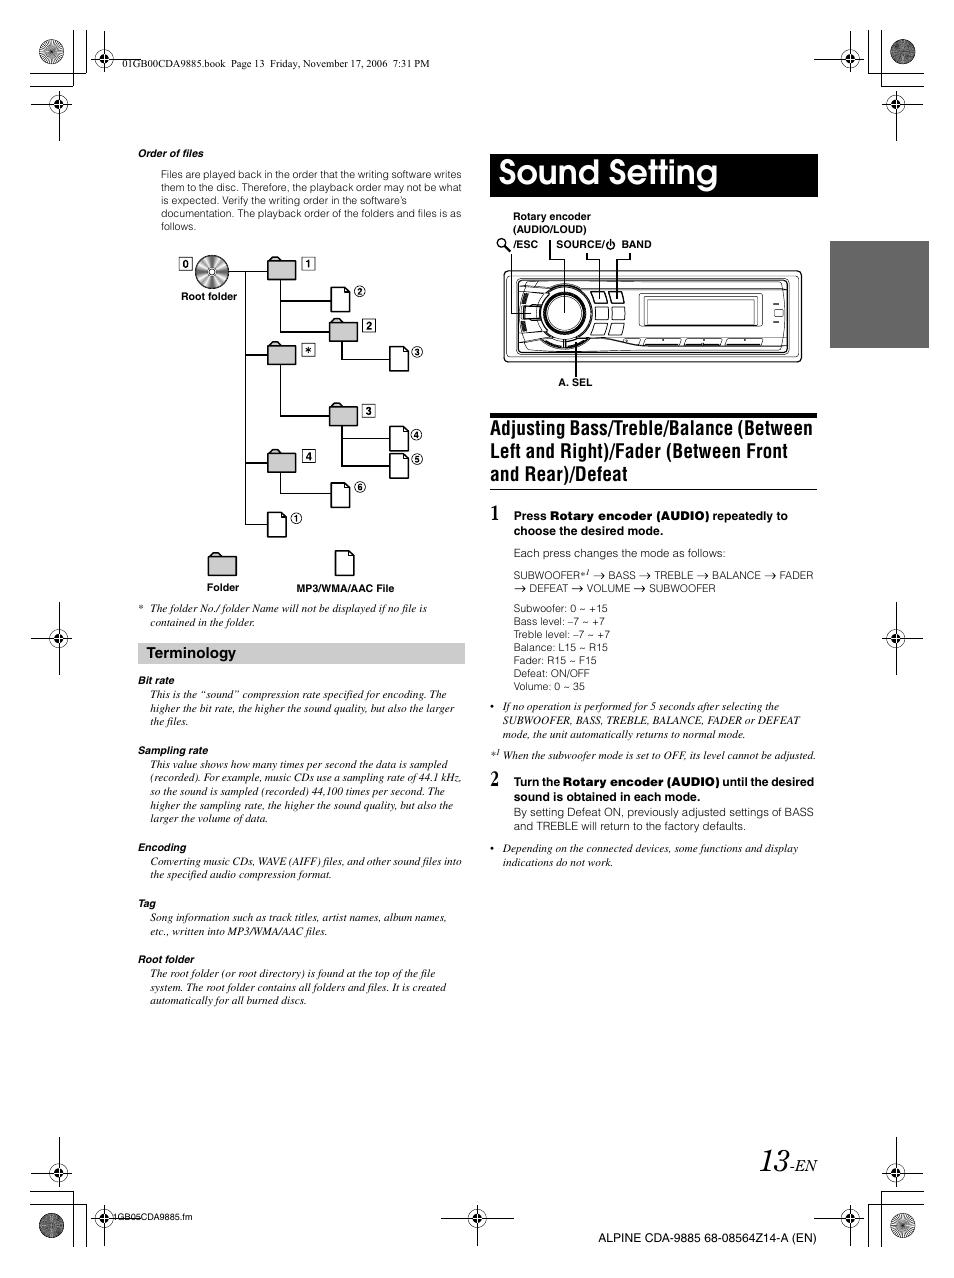 sound setting alpine cda 9885 user manual page 15 41 rh manualsdir com alpine cda 9855 manual alpine cda-9885 installation manual